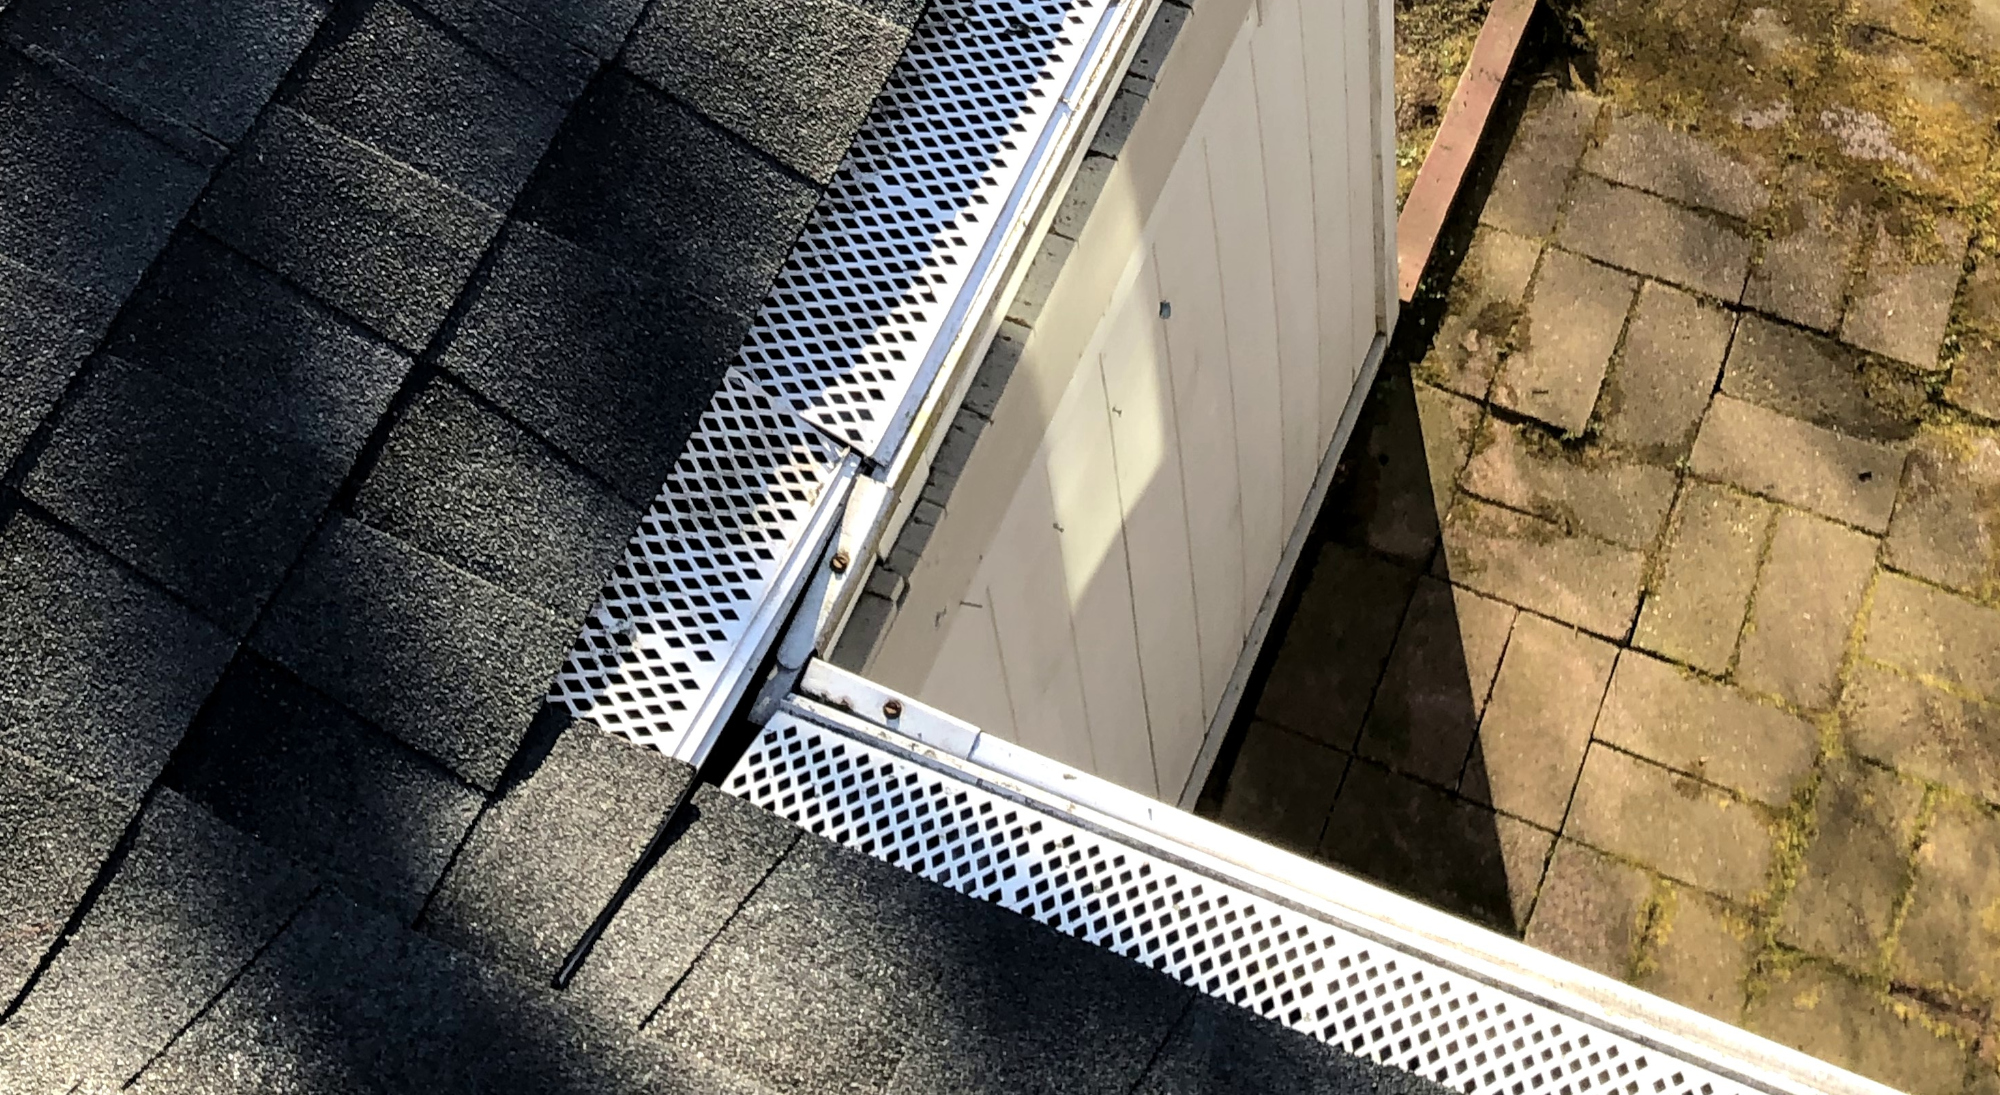 Columbia Roofers 21044, 21045, 21046